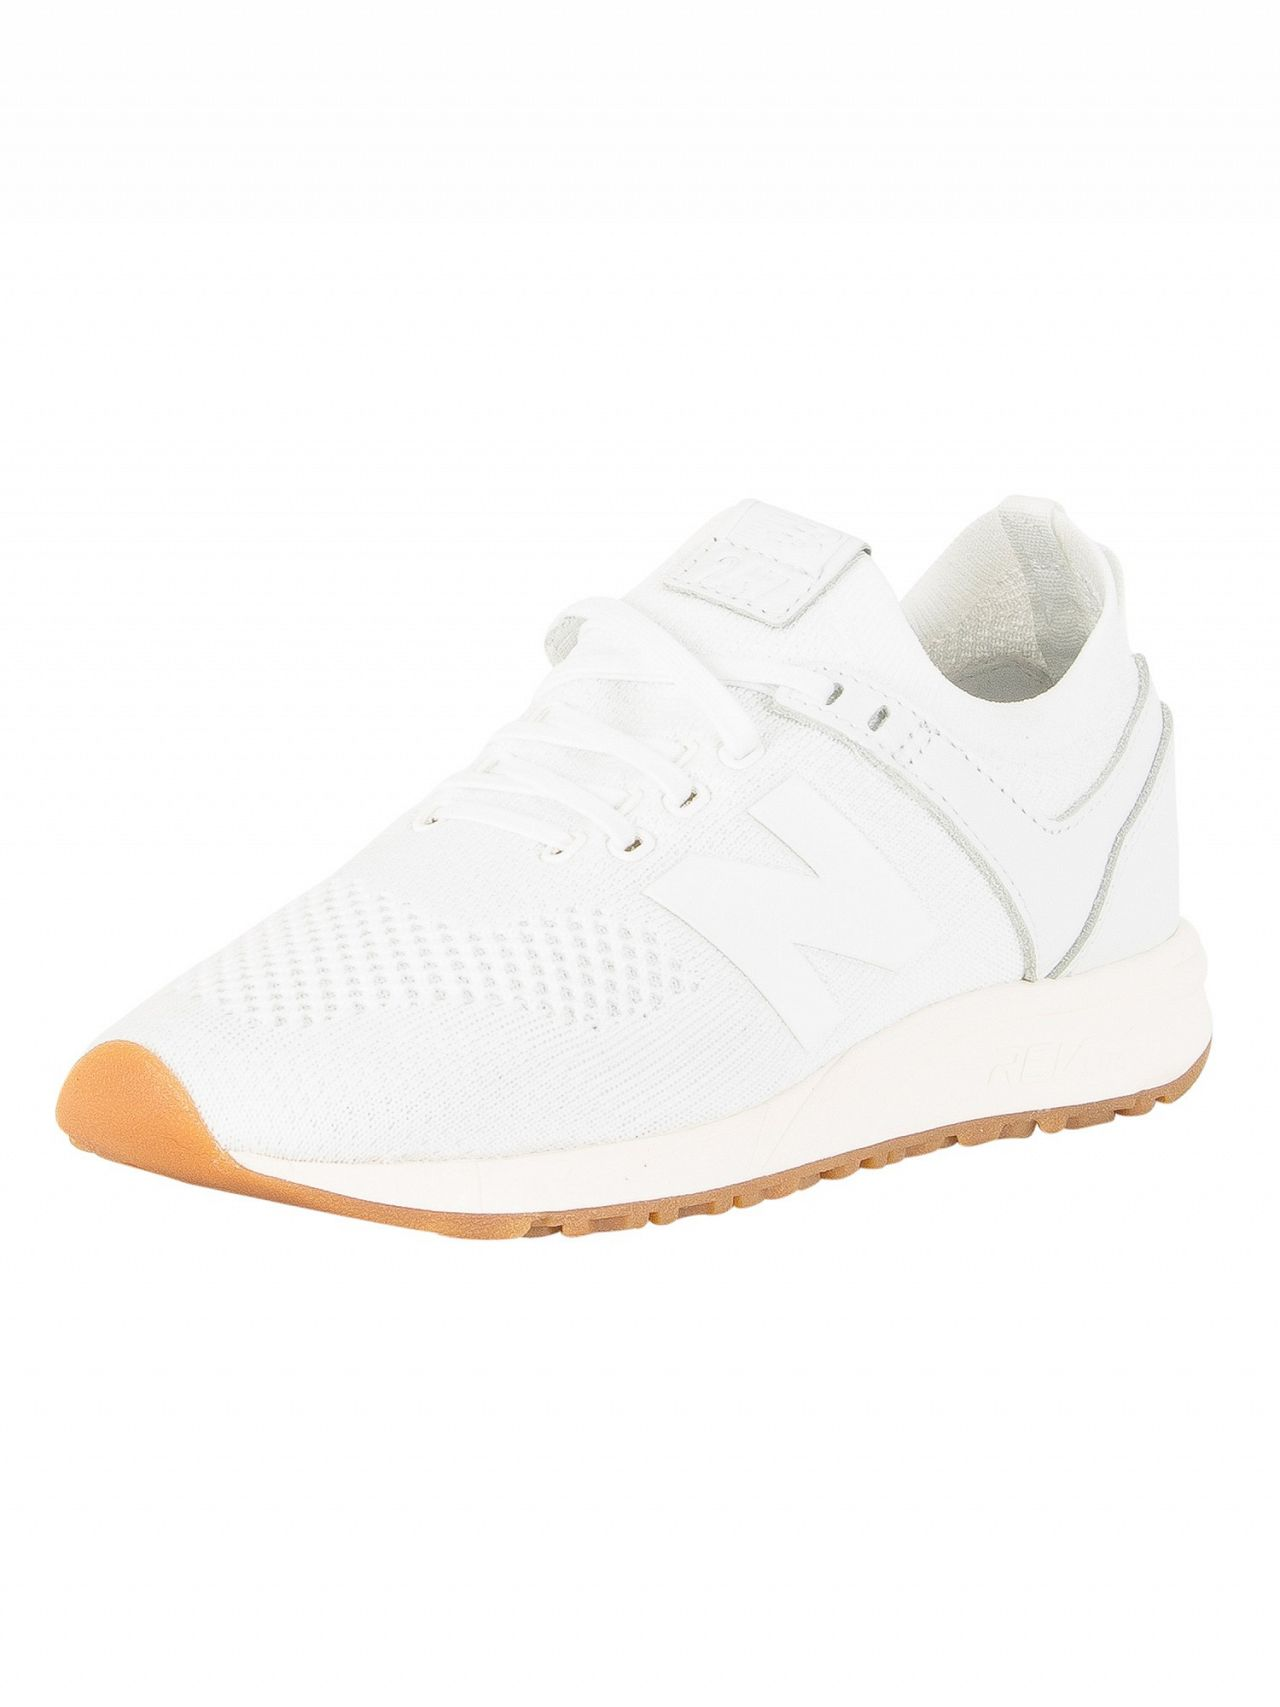 636e8206a912 New Balance White Gum 247 Trainers